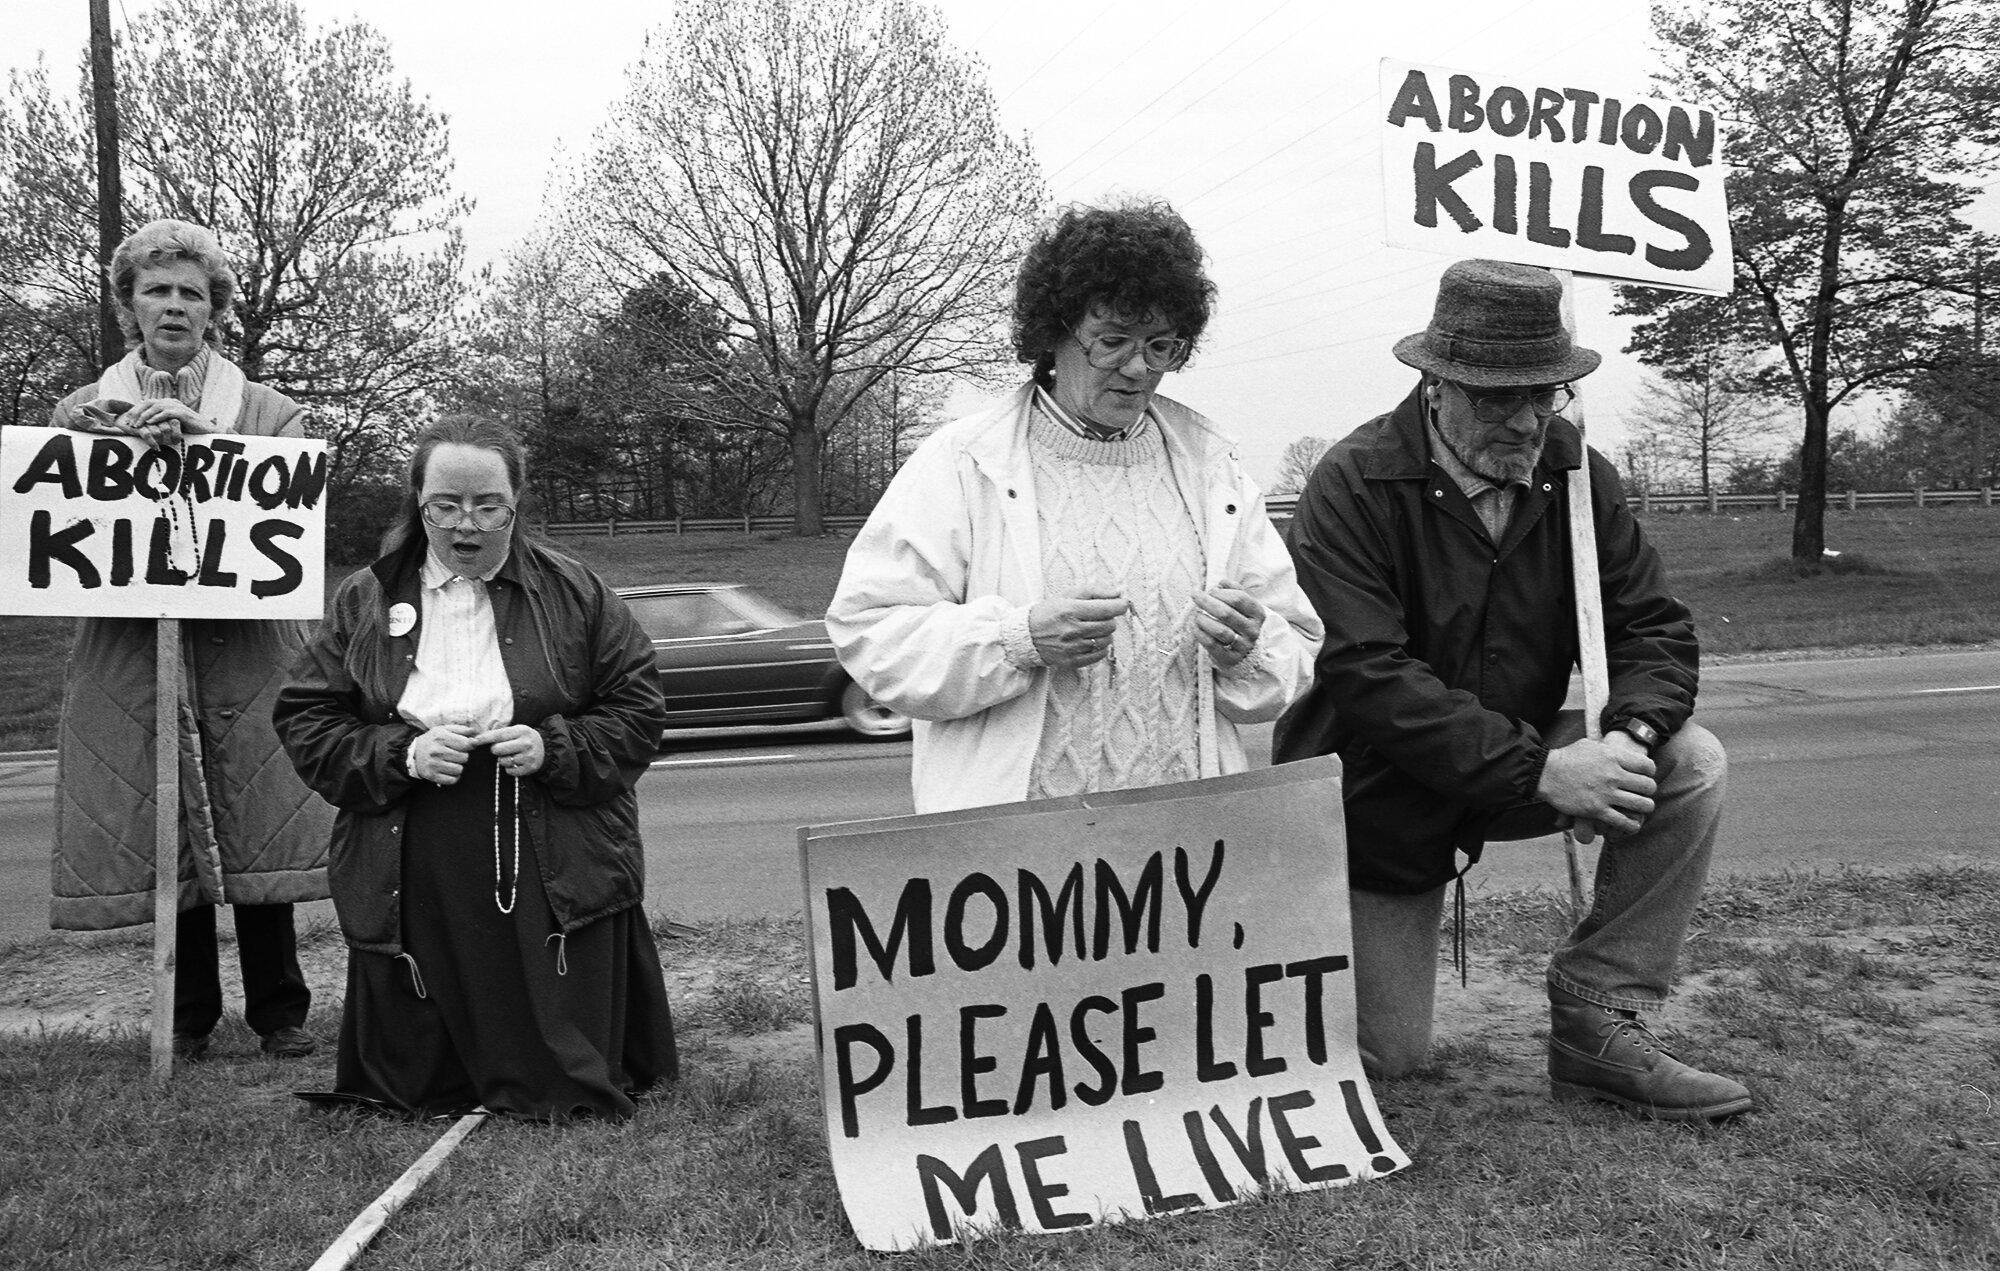 Abortion_Protest-014.jpg